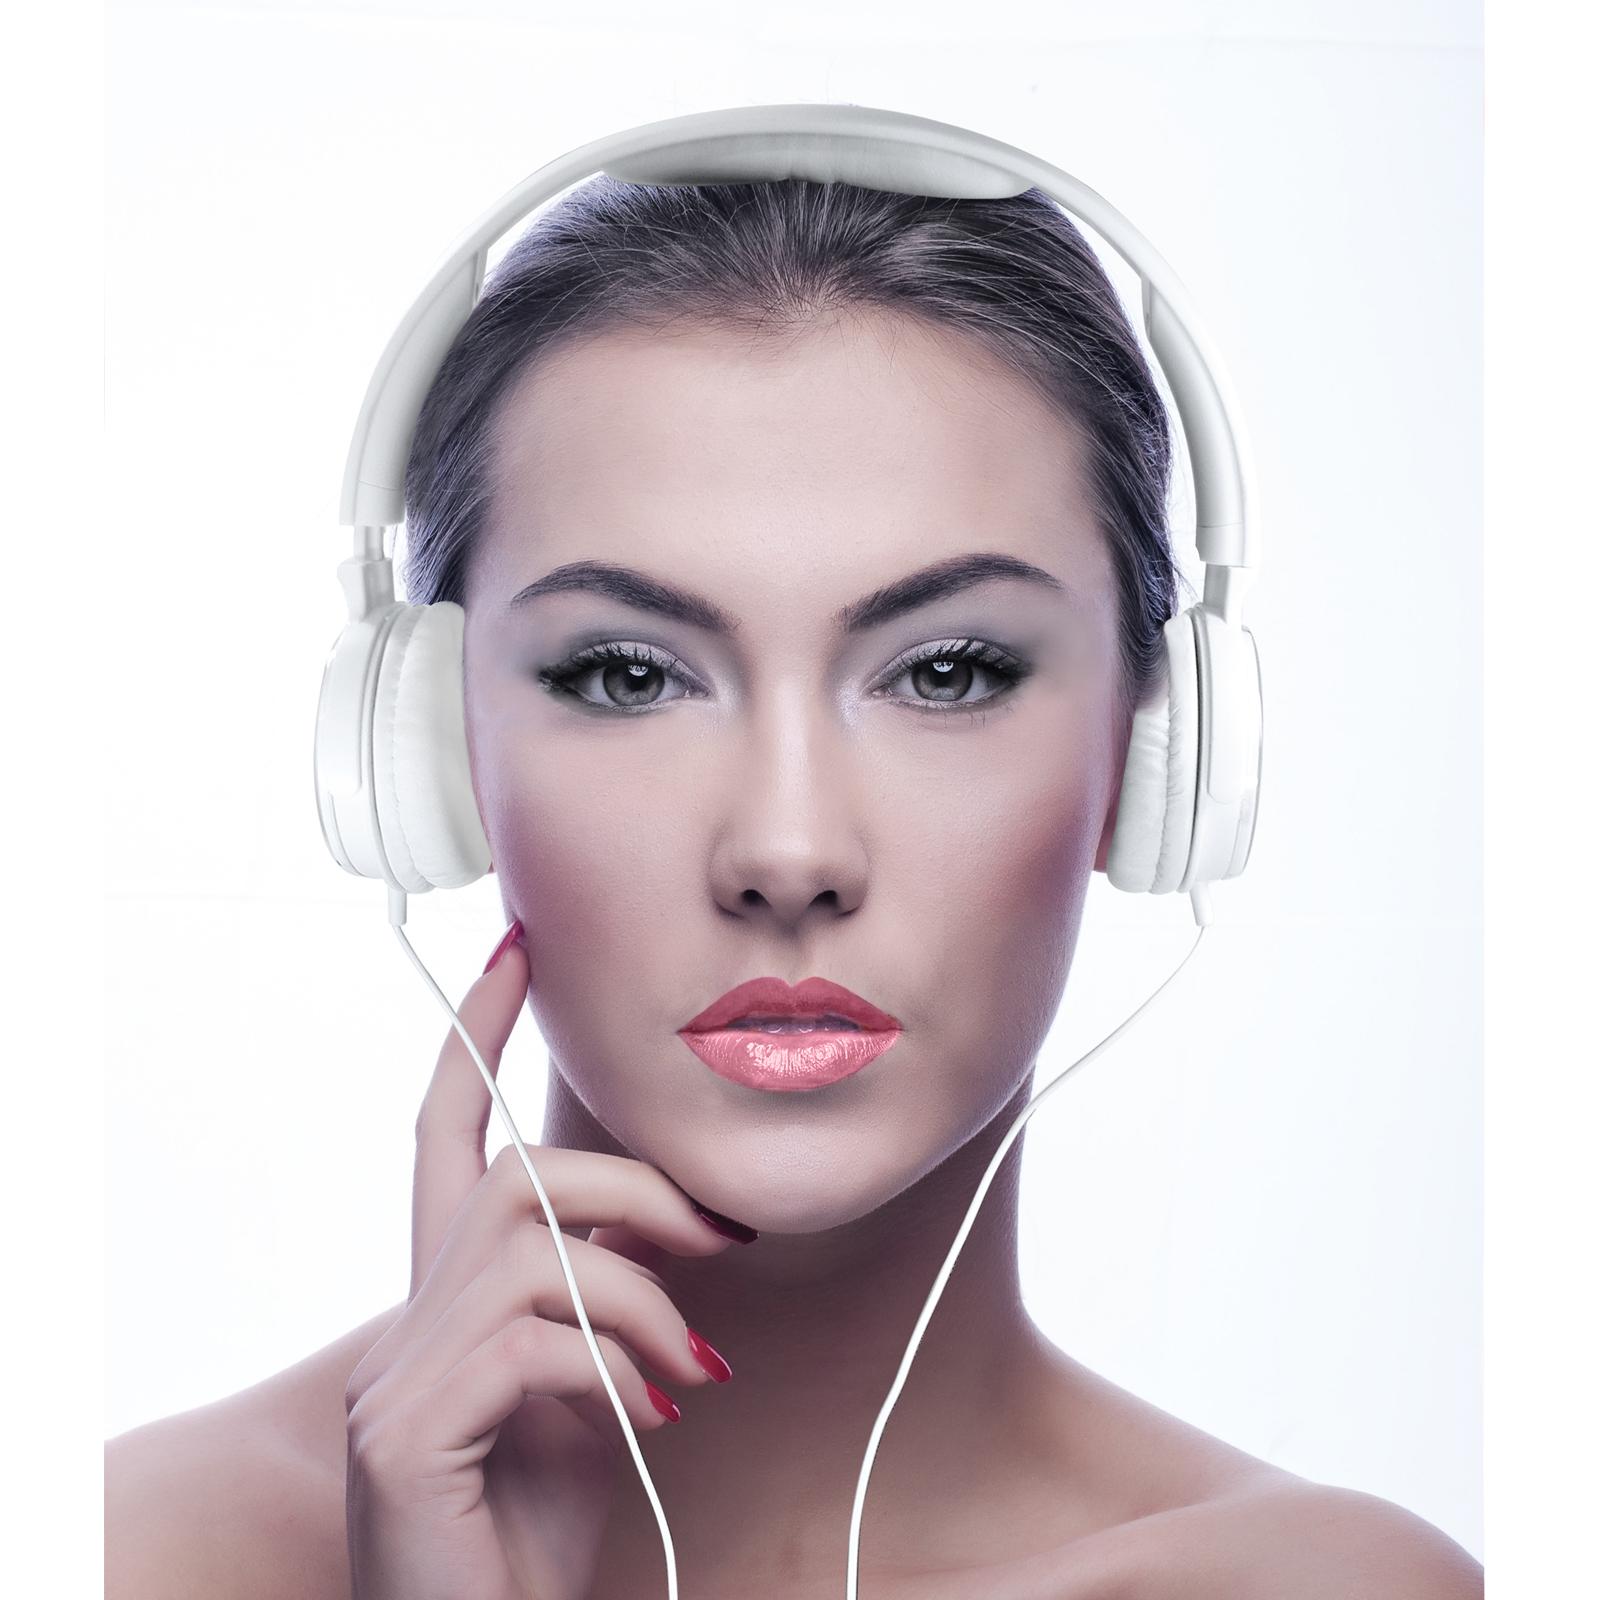 kopfh rer hifi stereo over ear kopfb gel audio f r mp3 cd. Black Bedroom Furniture Sets. Home Design Ideas